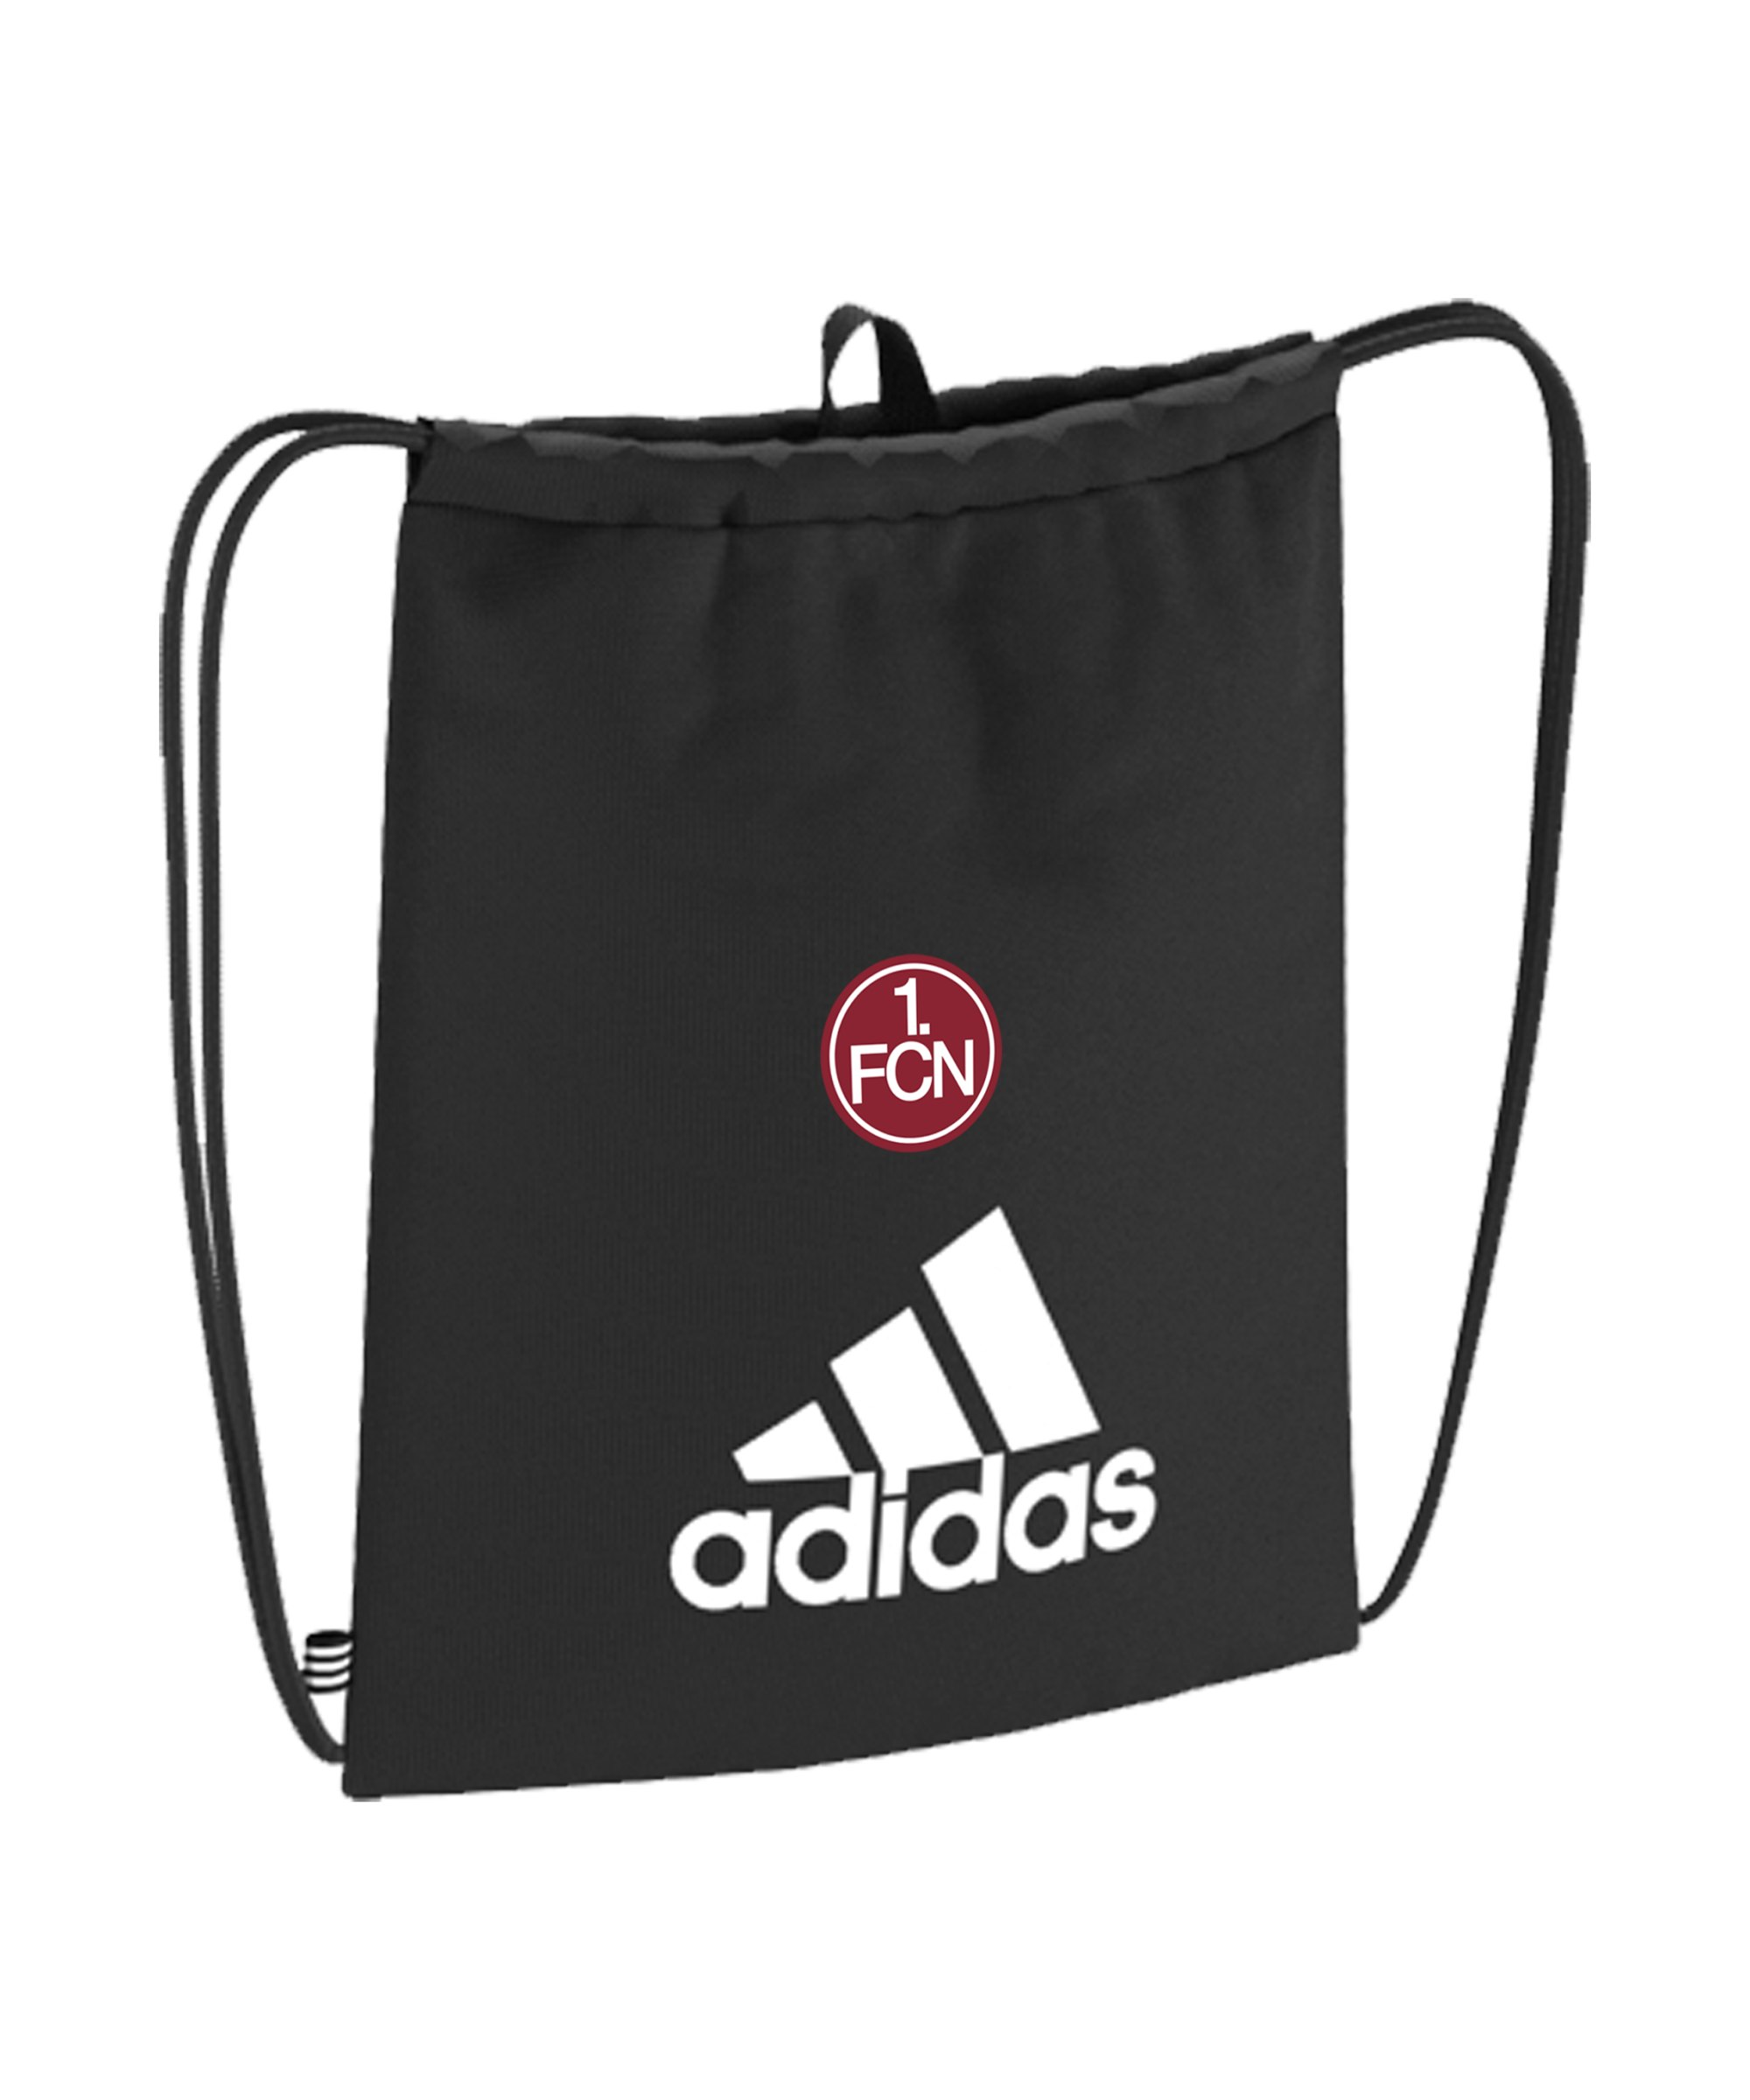 adidas 1. FC Nürnberg Tiro Gymsack Schwarz - schwarz